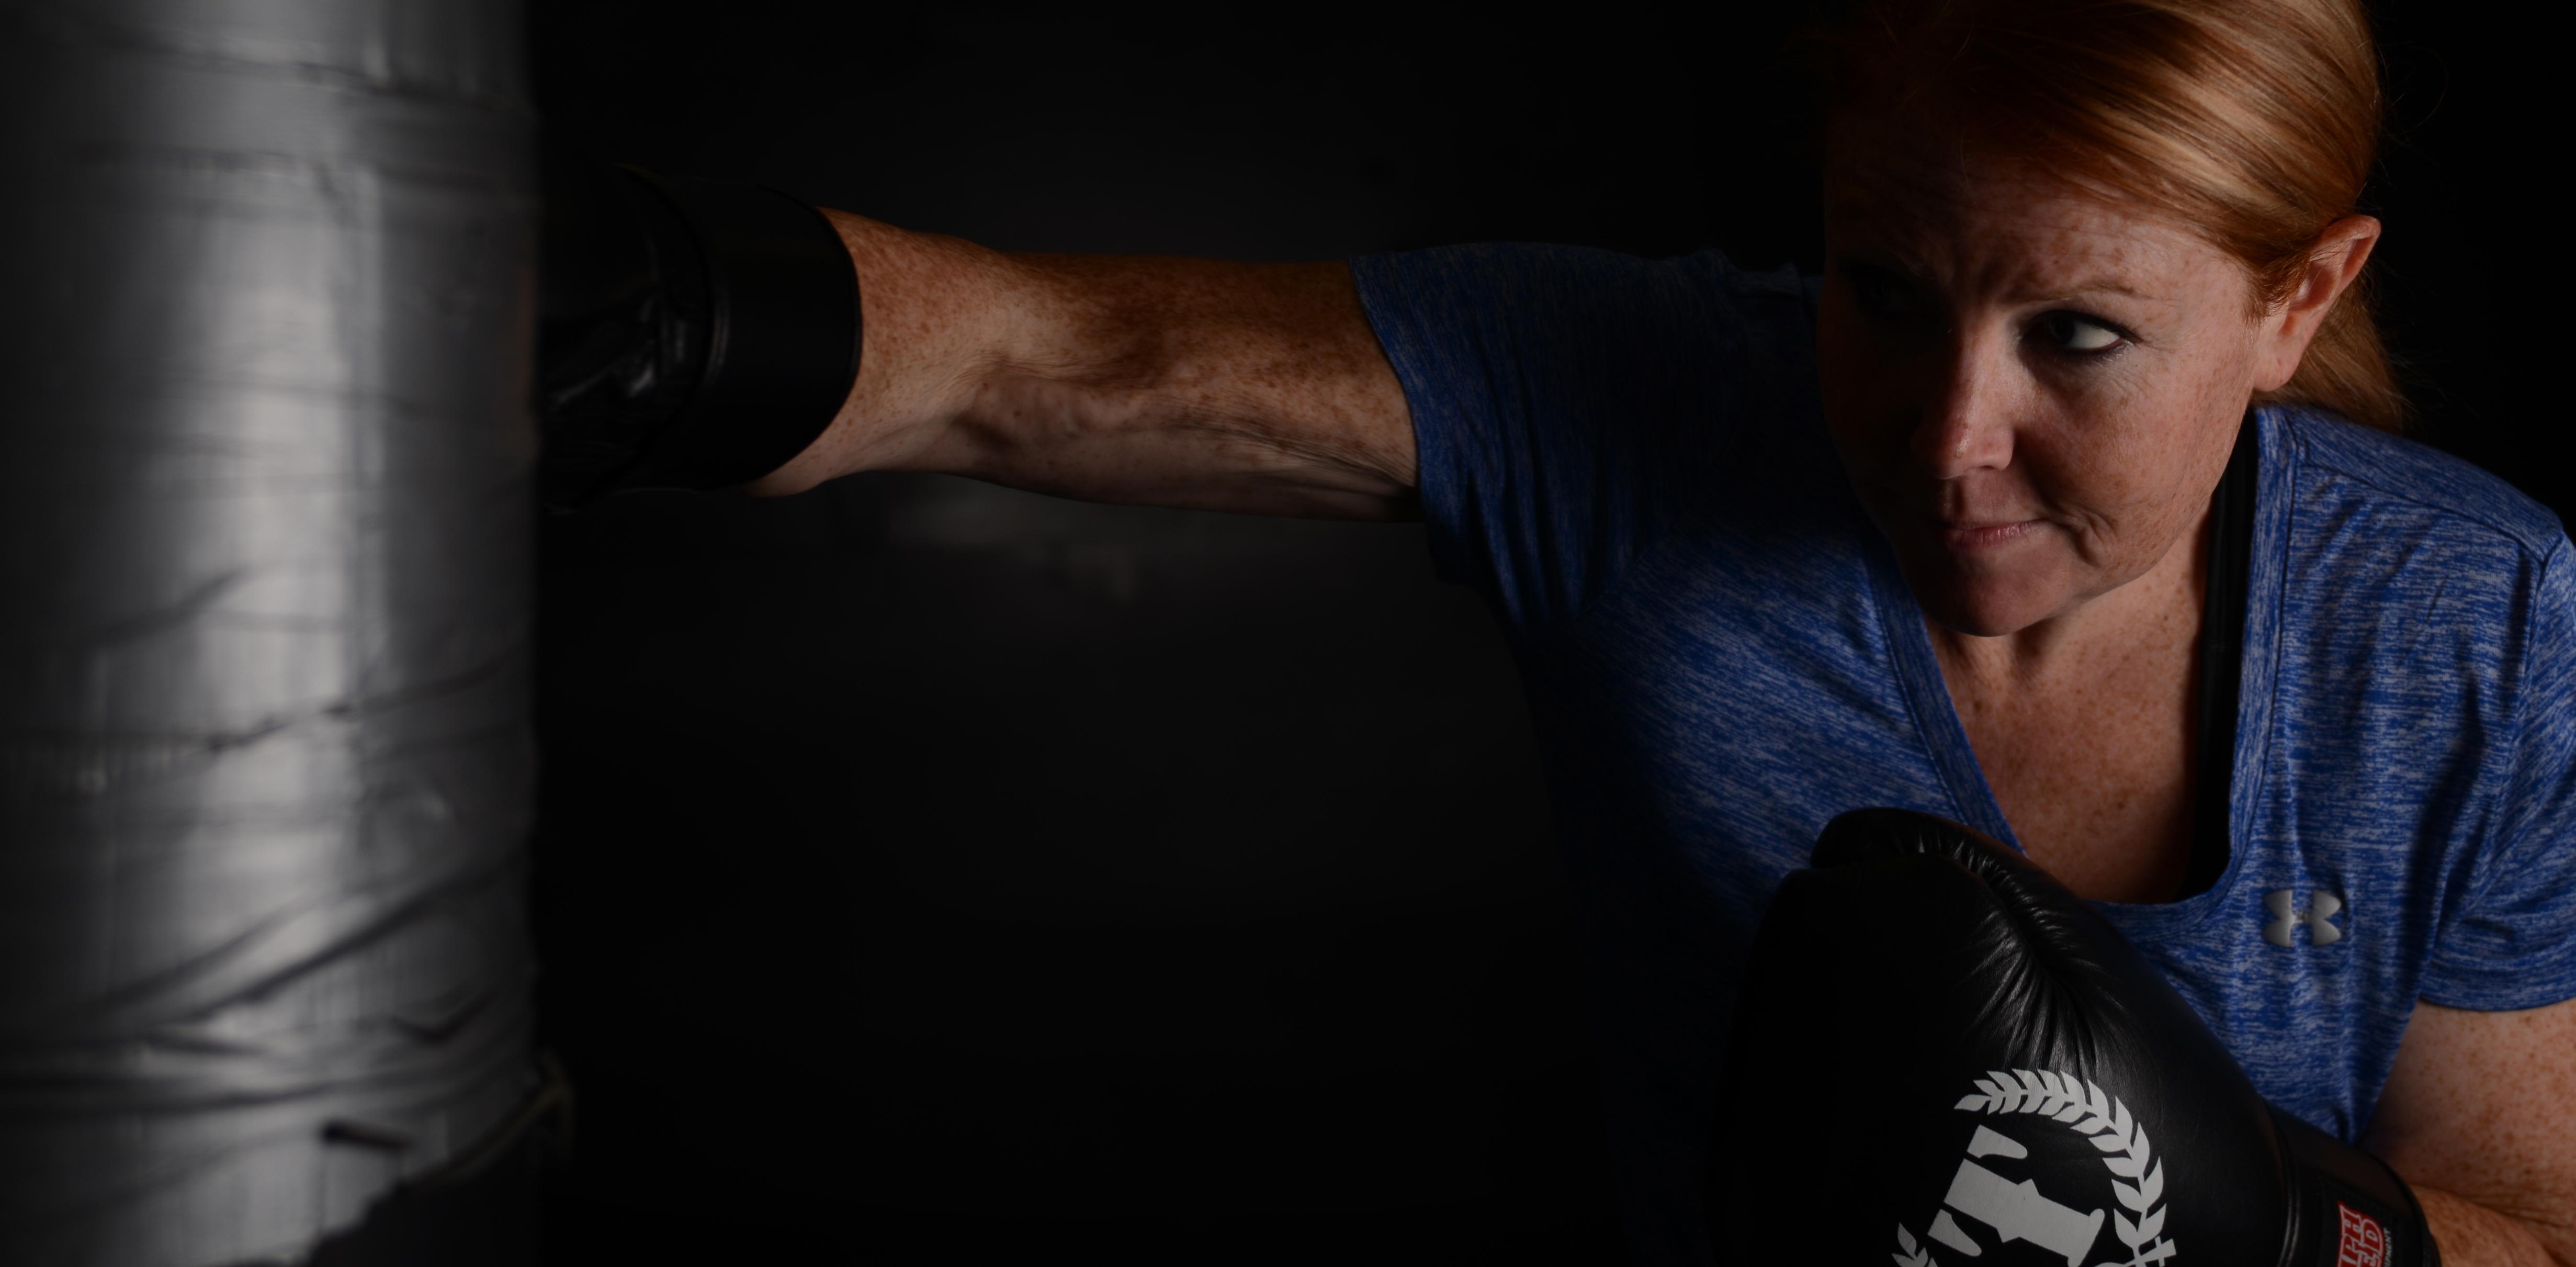 Israeli martial art Krav Maga keeps DINFOS instructor safe, fit